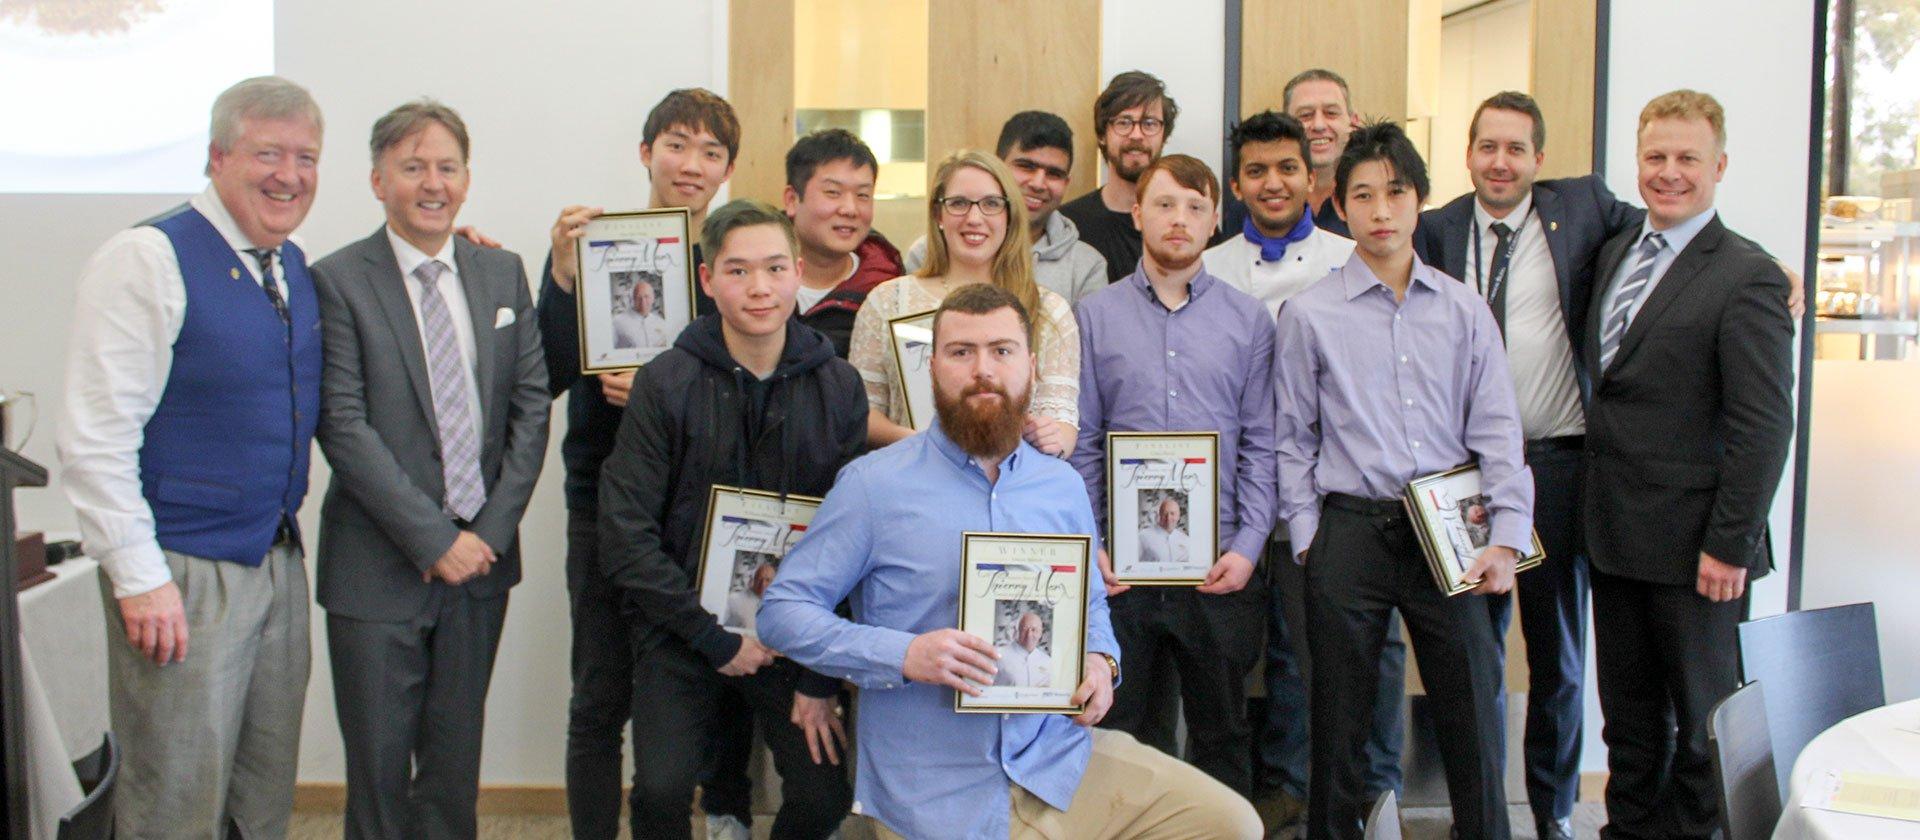 Thierry Marx Career Development Award finalists at Le Cordon Bleu Melbourne